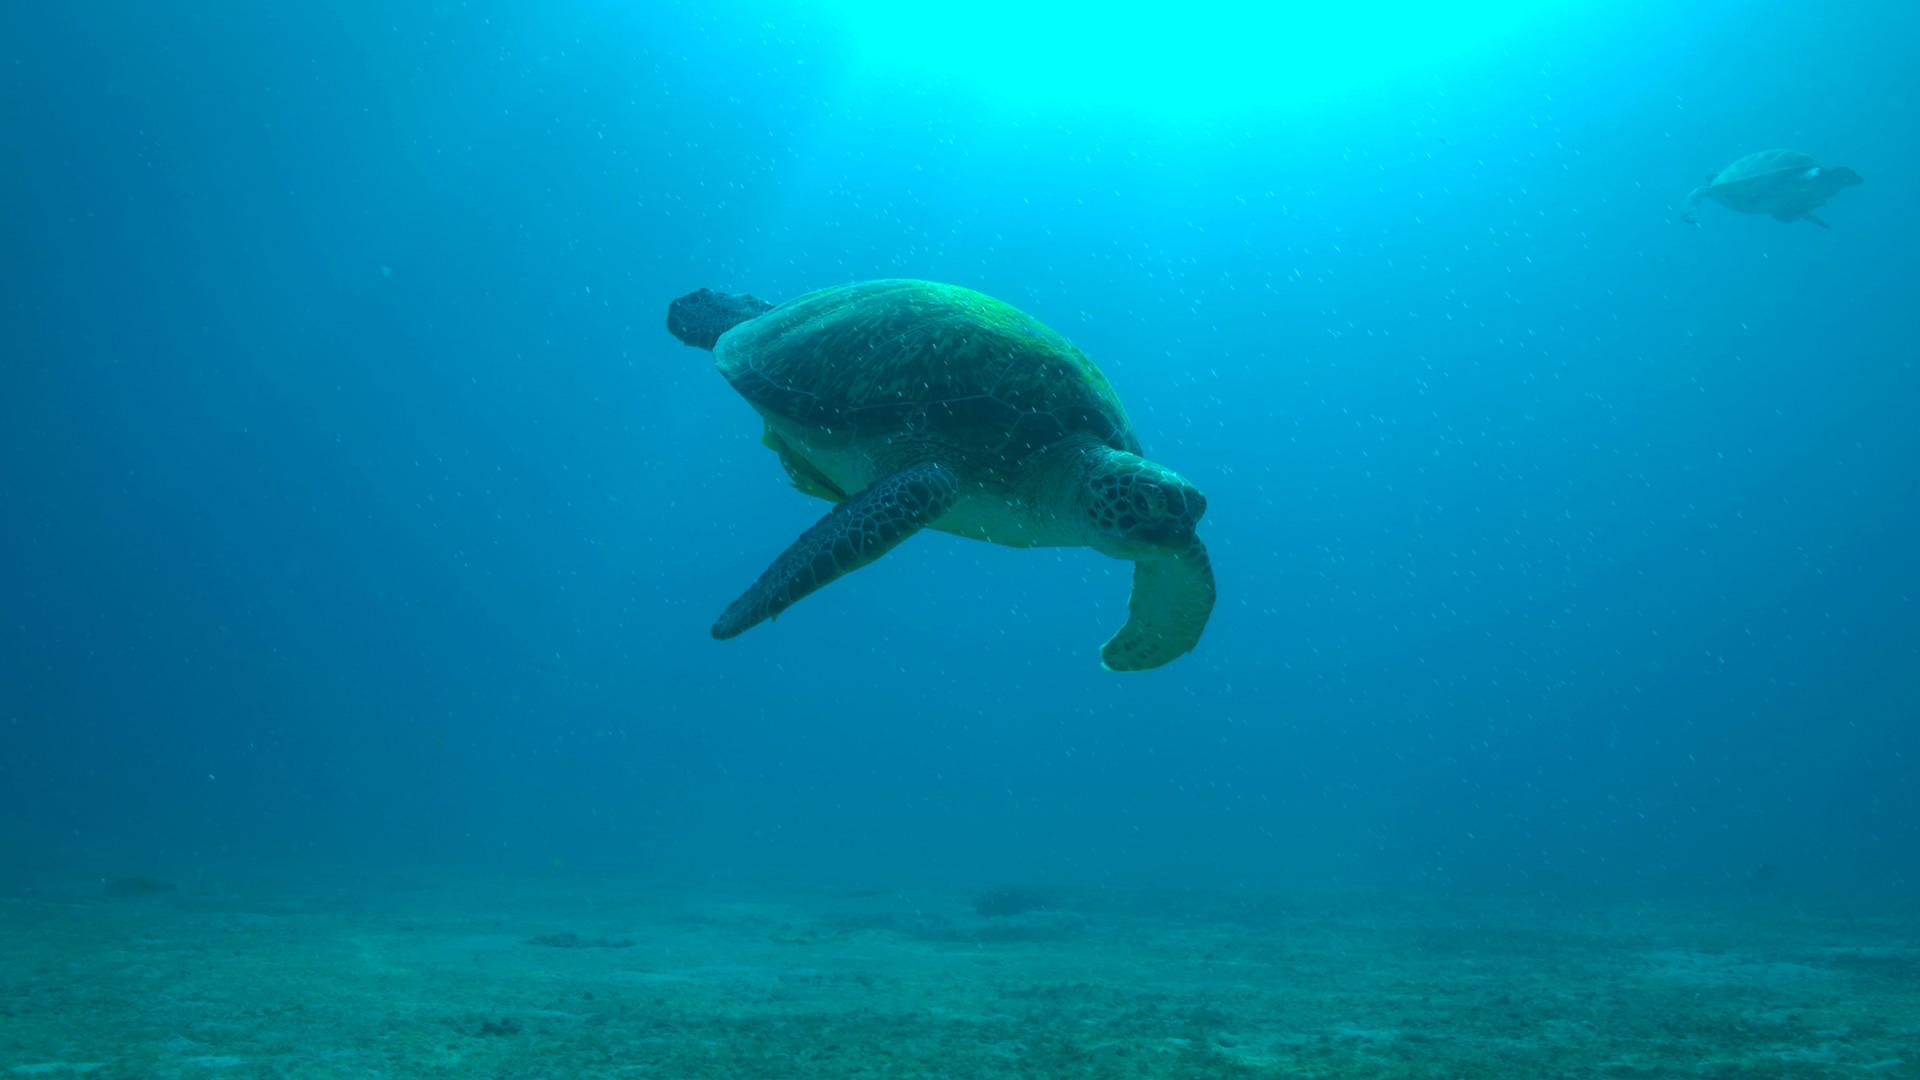 Green sea turtle diving at Coron, Palawan, Philippines.